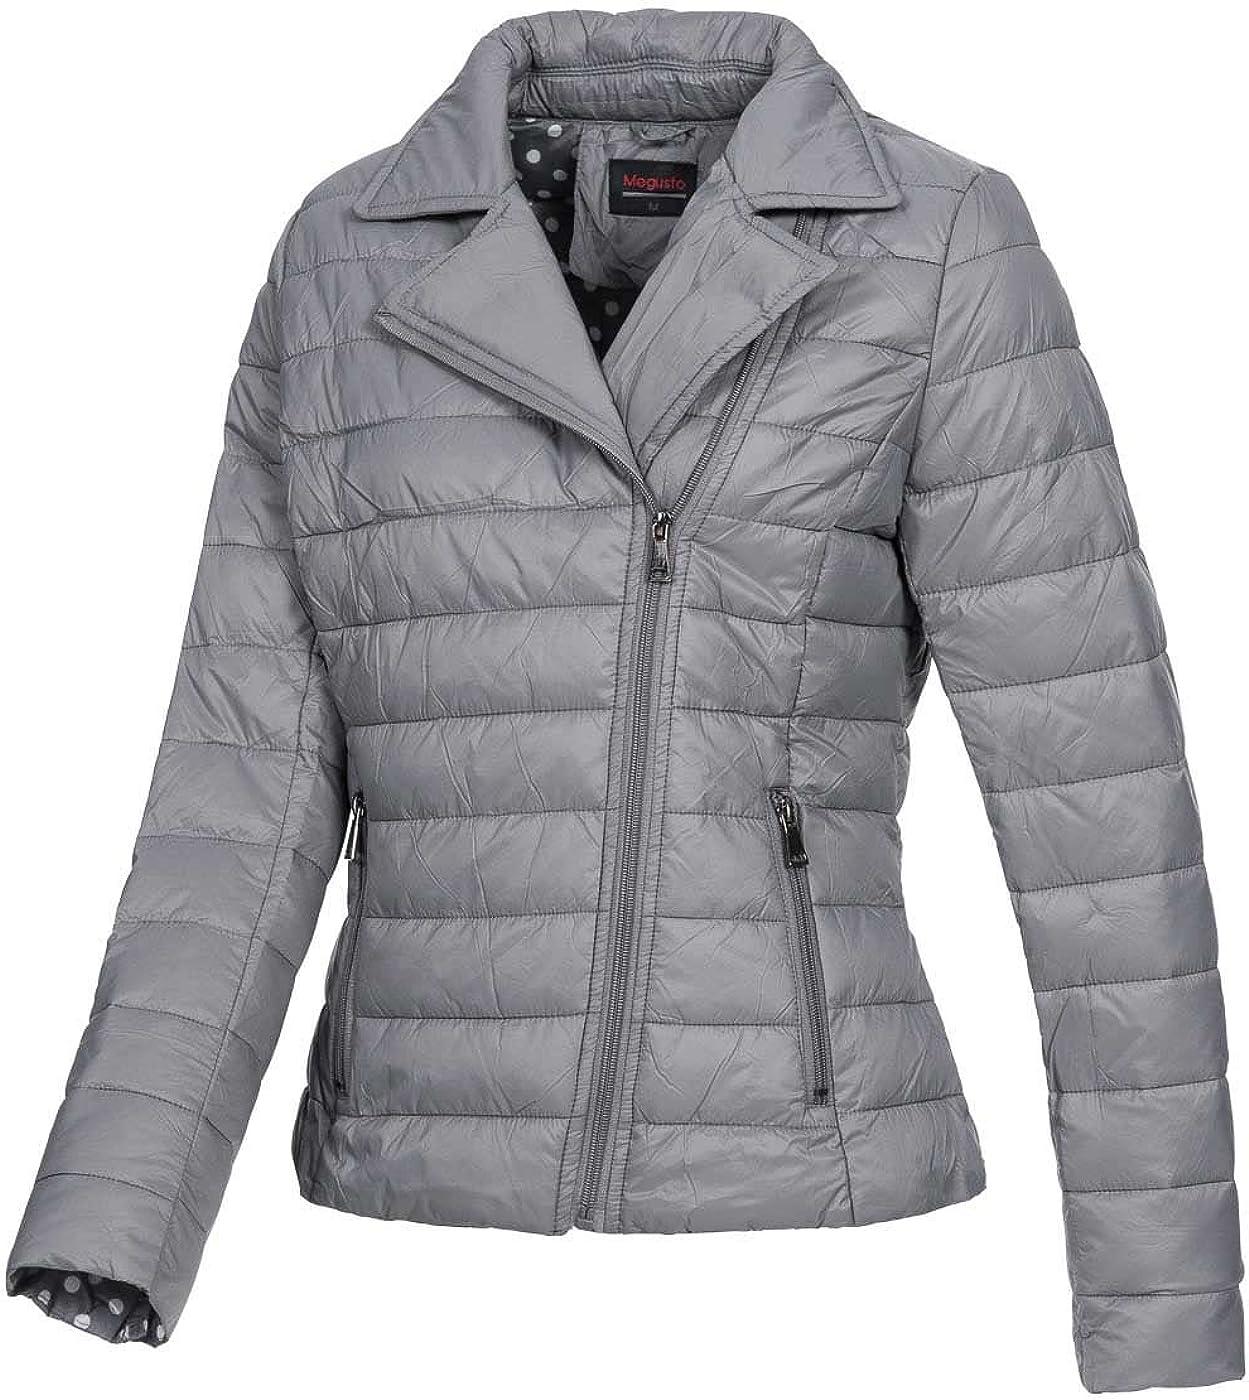 dunkelgrau 69/% OFF Violet fashion Damen Nylon Jacke IV101 Bikerjacken Stil